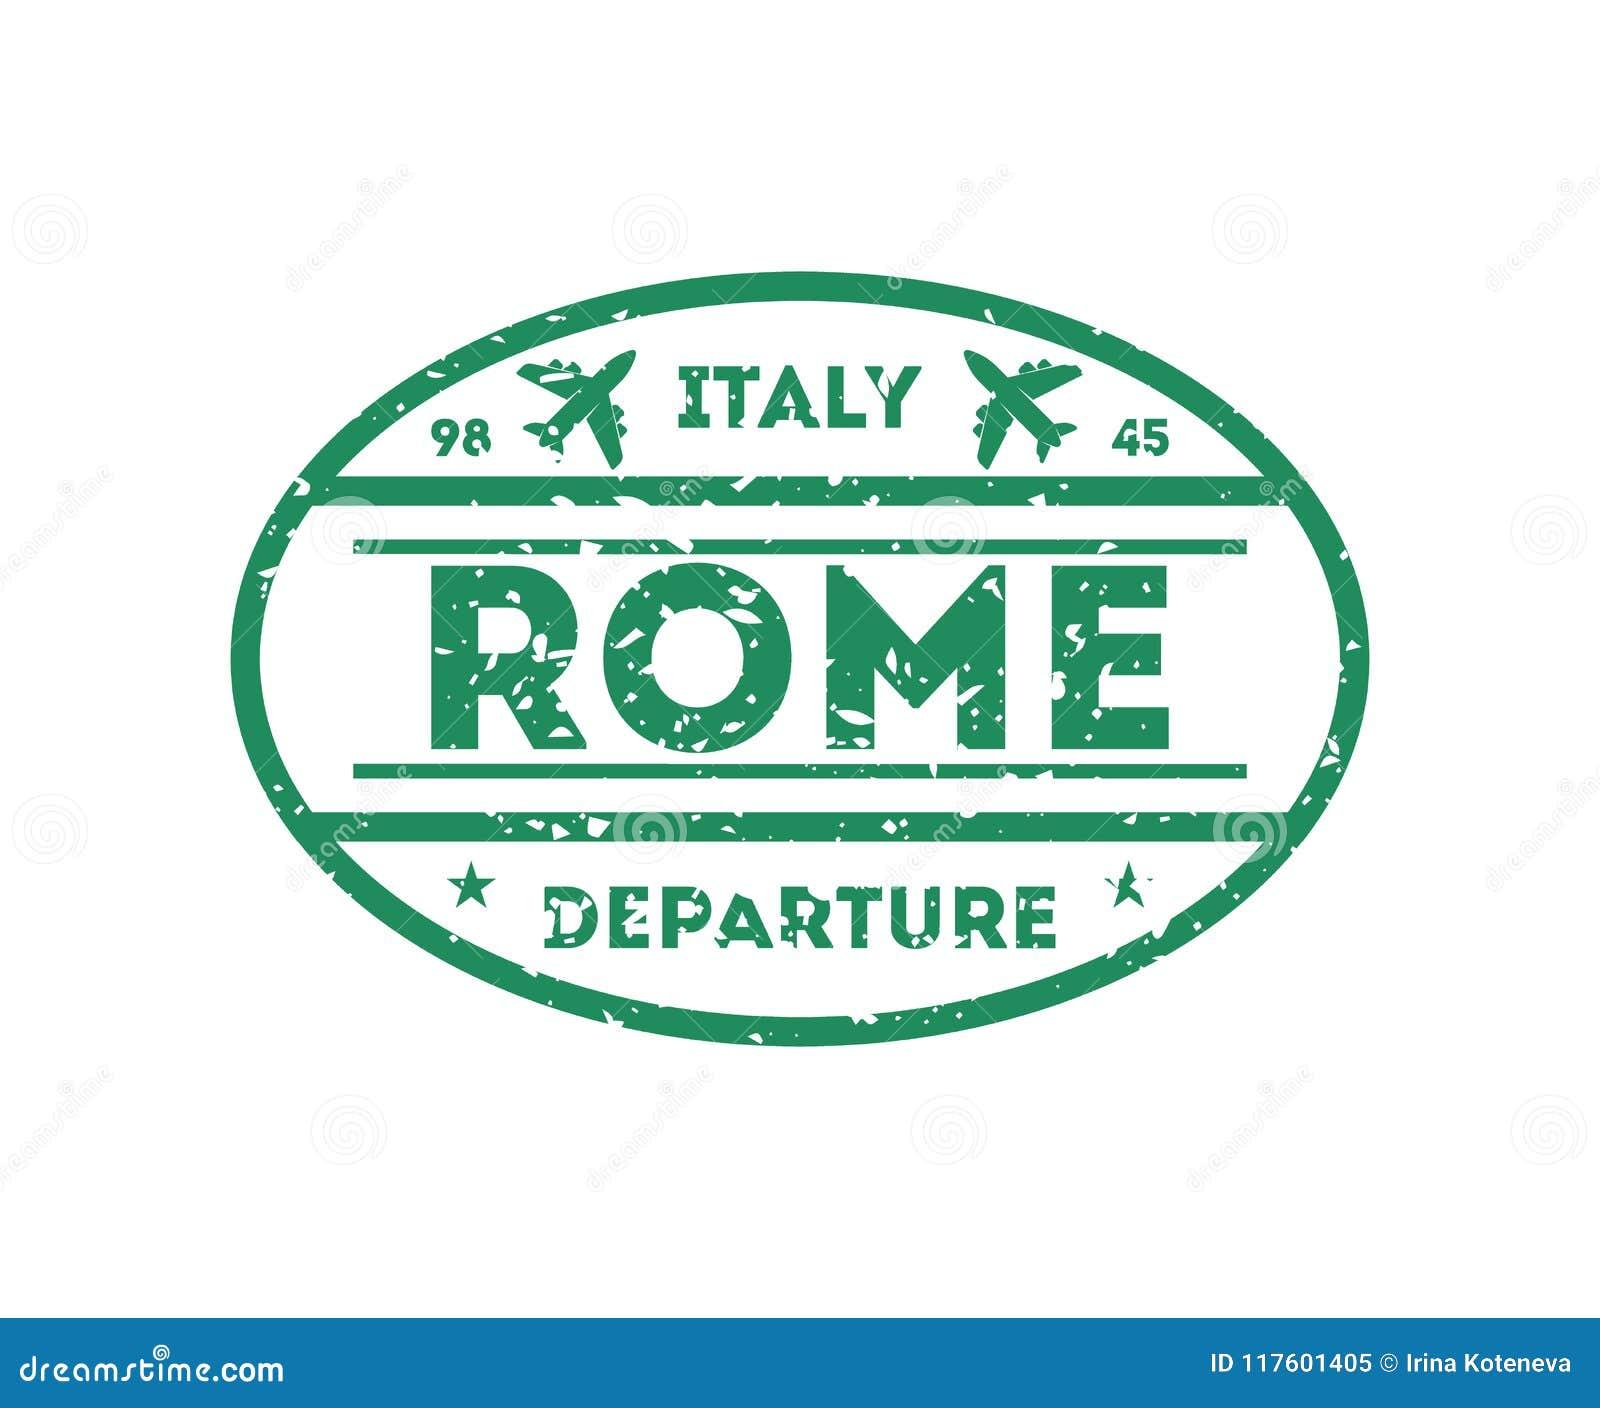 Rome City Visa Stamp On Passport Stock Vector Illustration Of